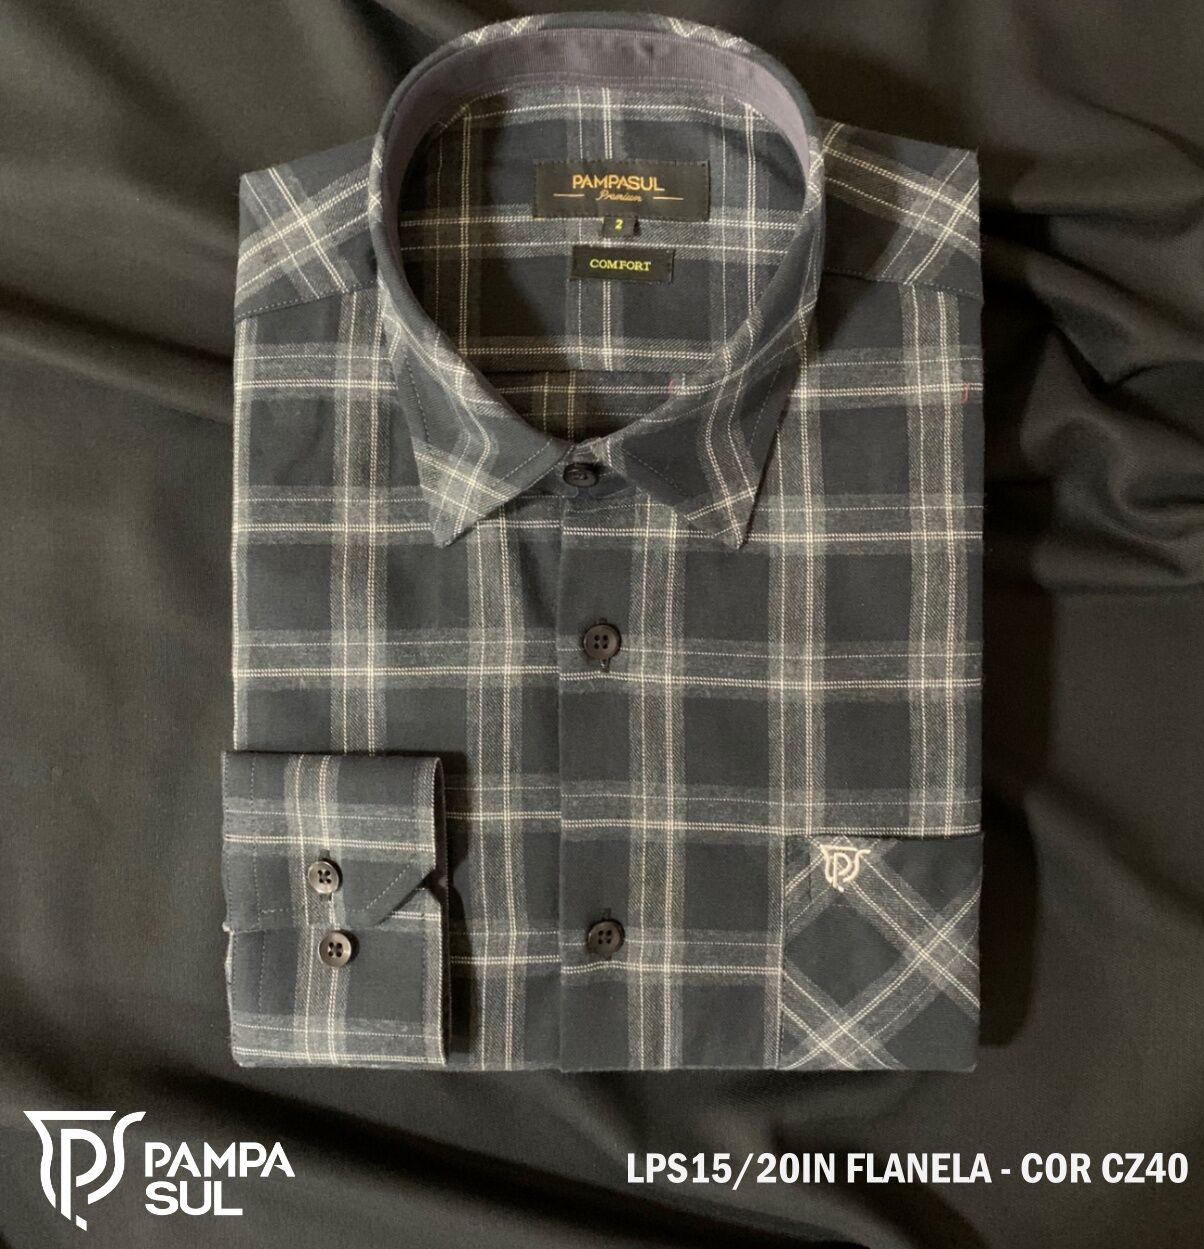 Camisa Pampa Sul Masculina Xadrez Tecido Flanela